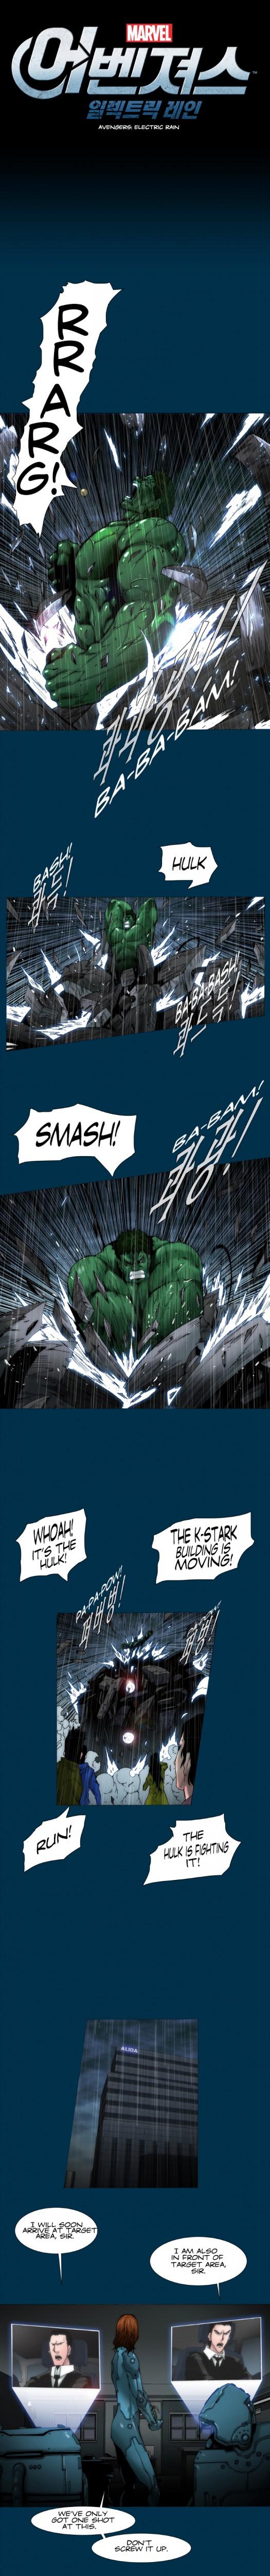 avengers-electric-rain-11-1